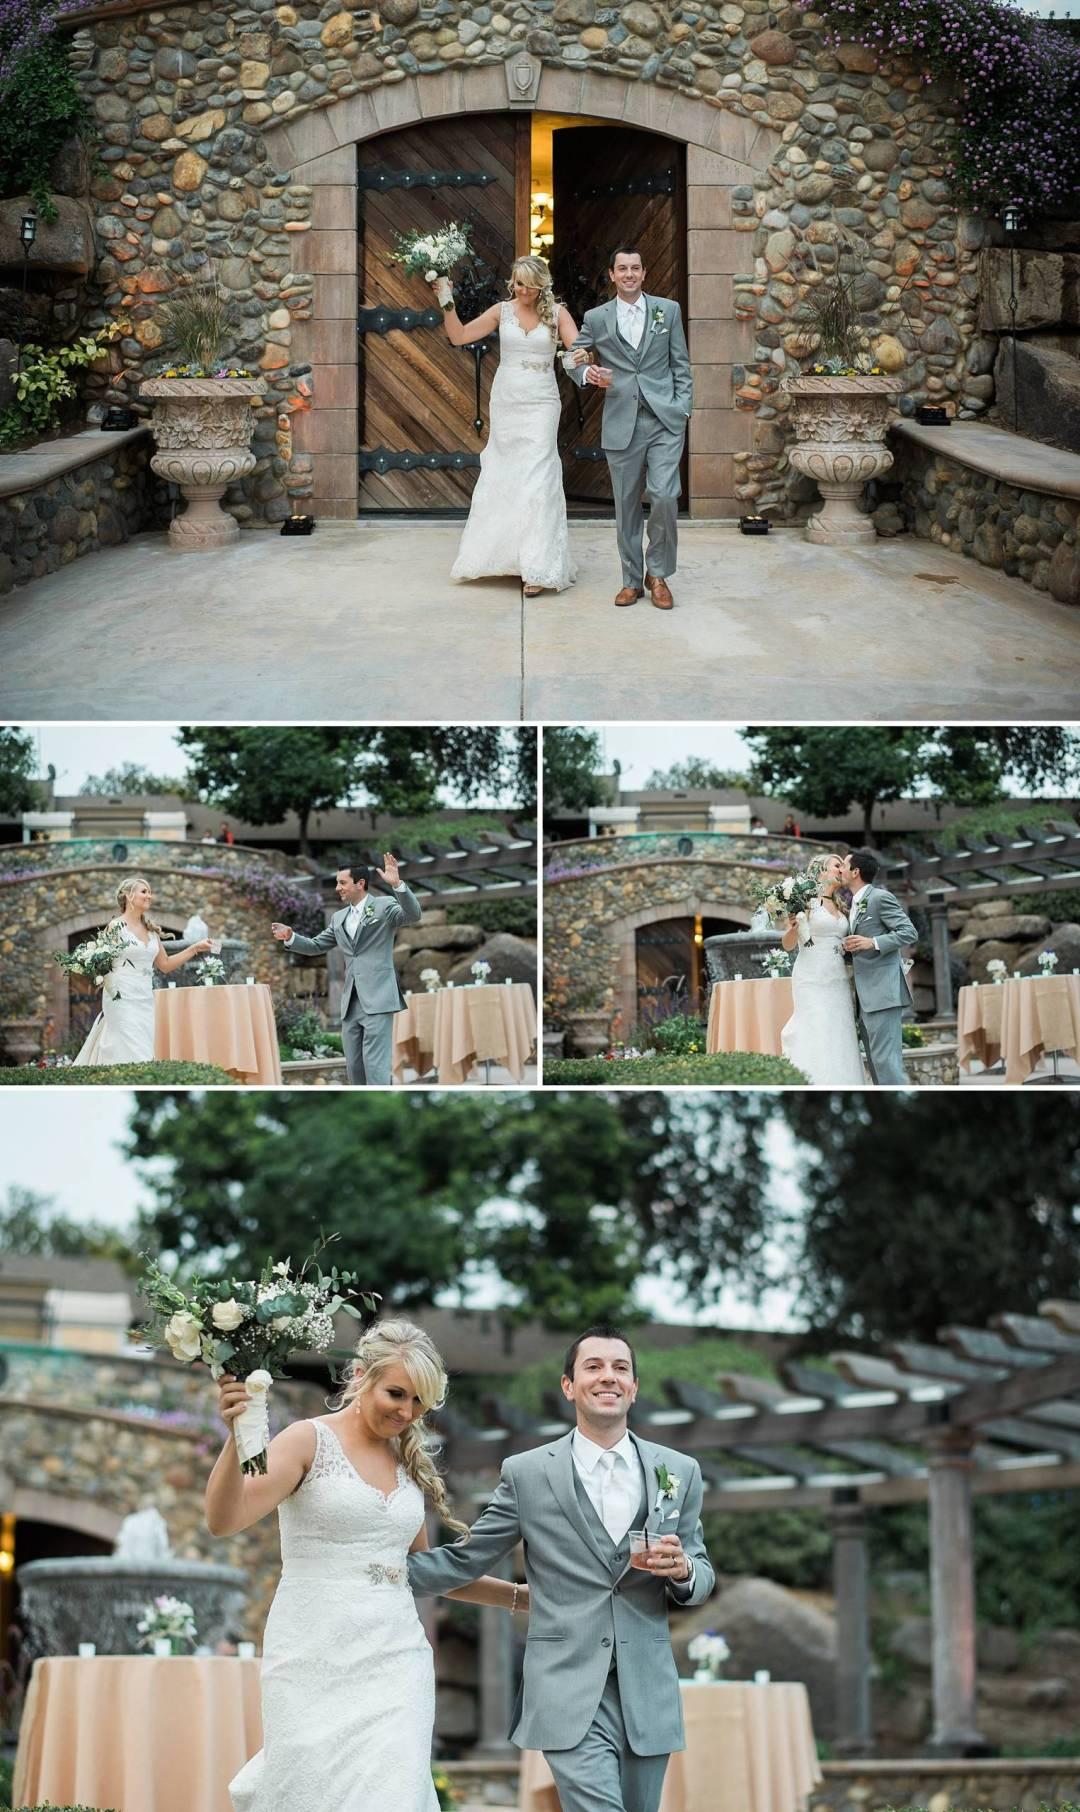 Erin + Marcel Third Element Photography & Cinema Fresno County Estate Wedding Hybrid Film Wedding Photographer_0047